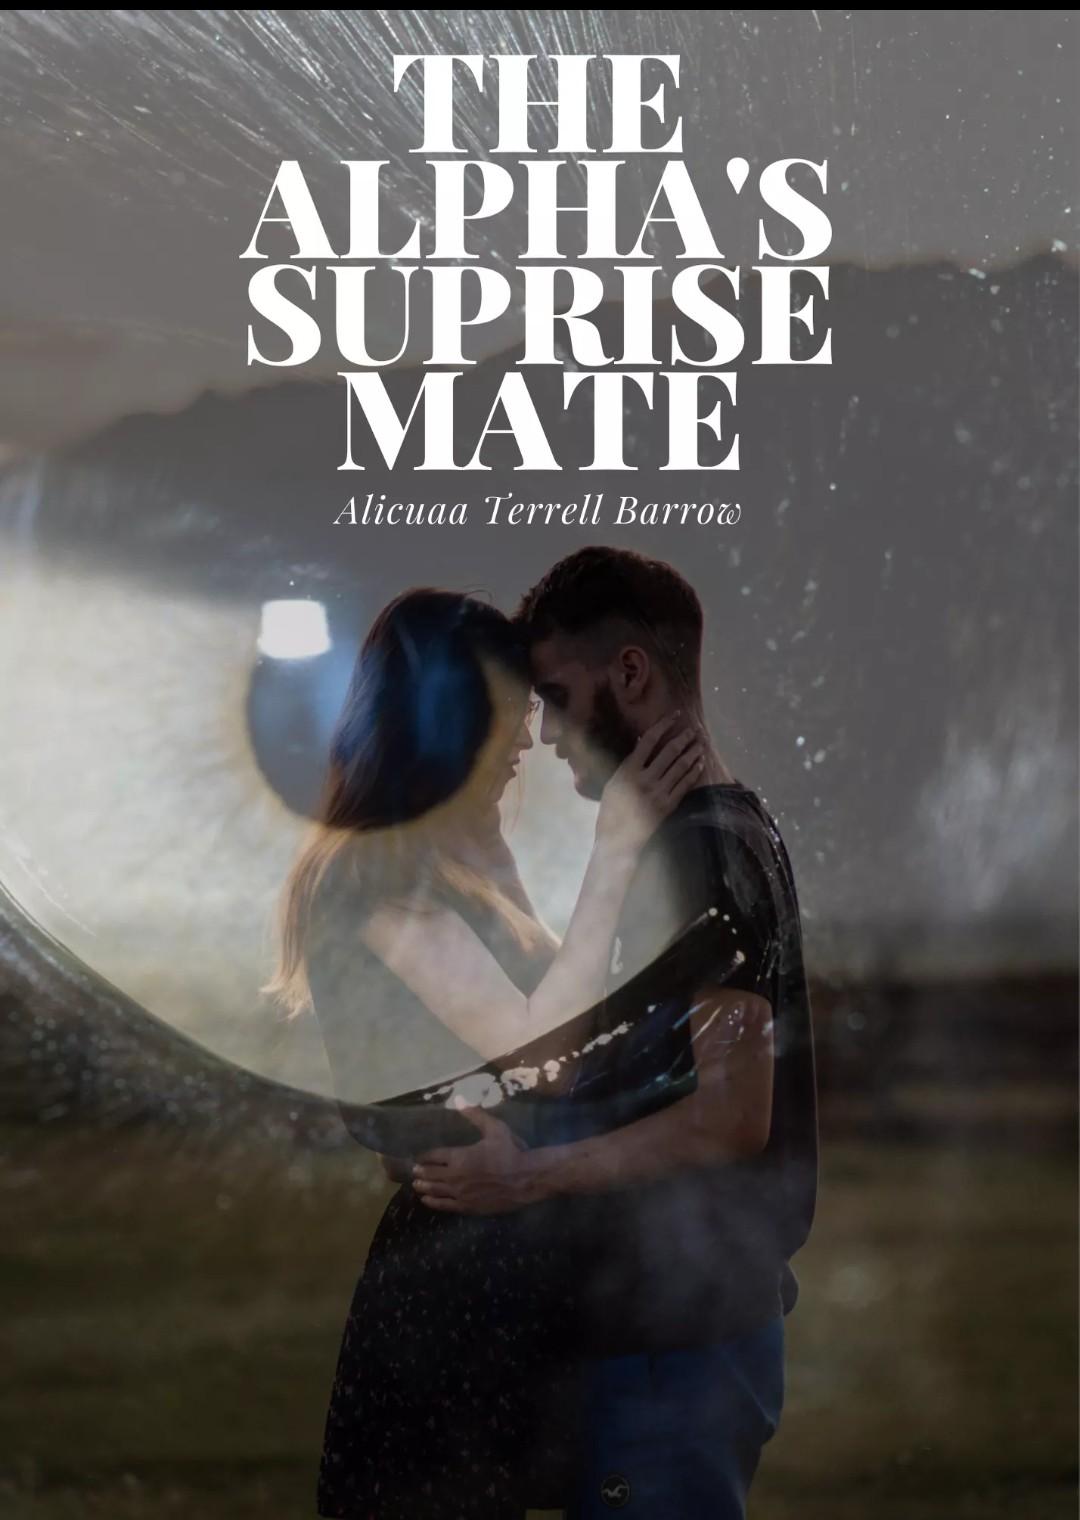 The Alpha's Surprise Mate